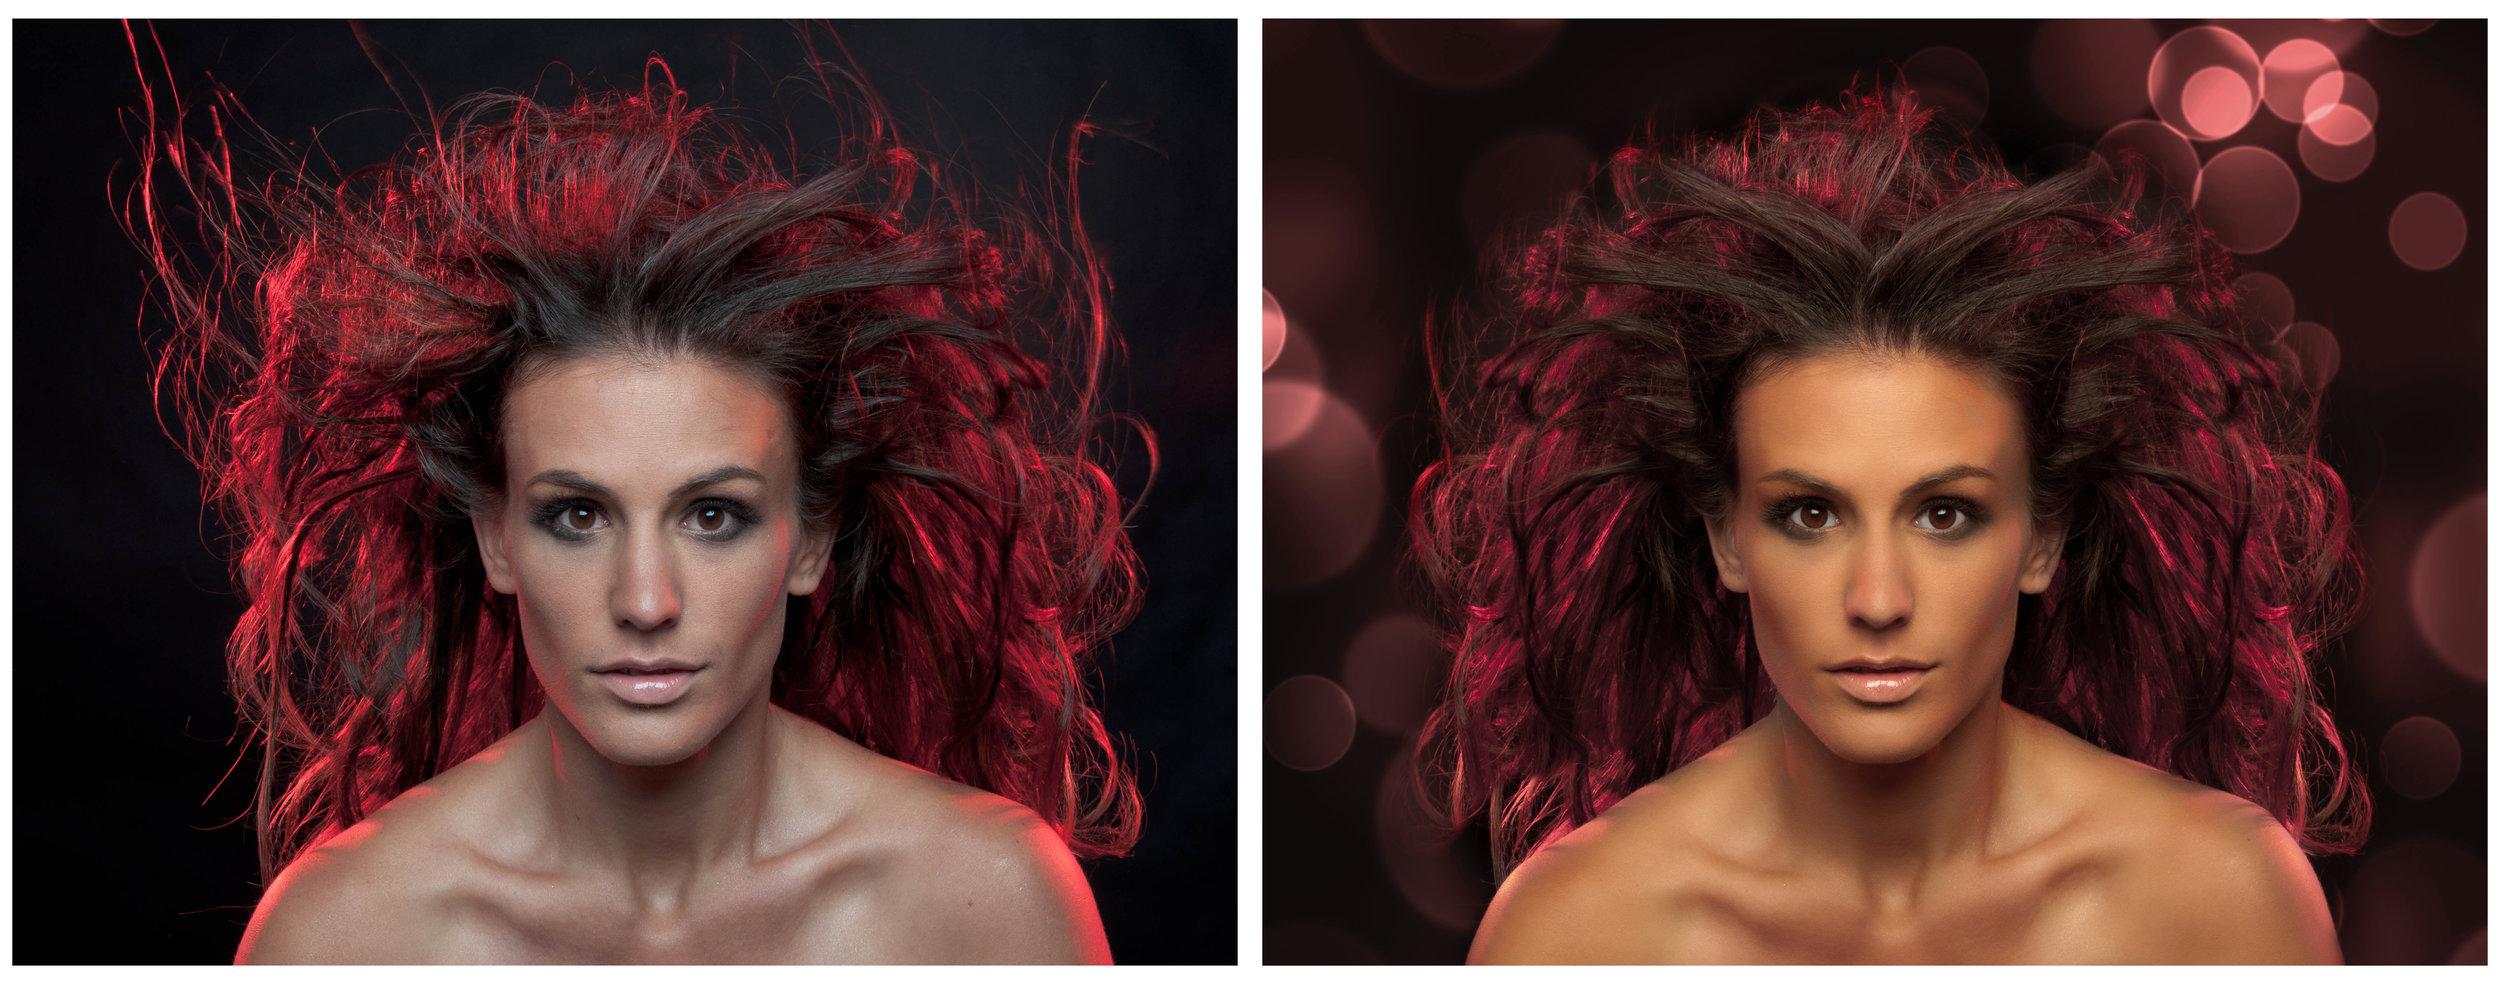 Background manipulation, hair and skin retouching